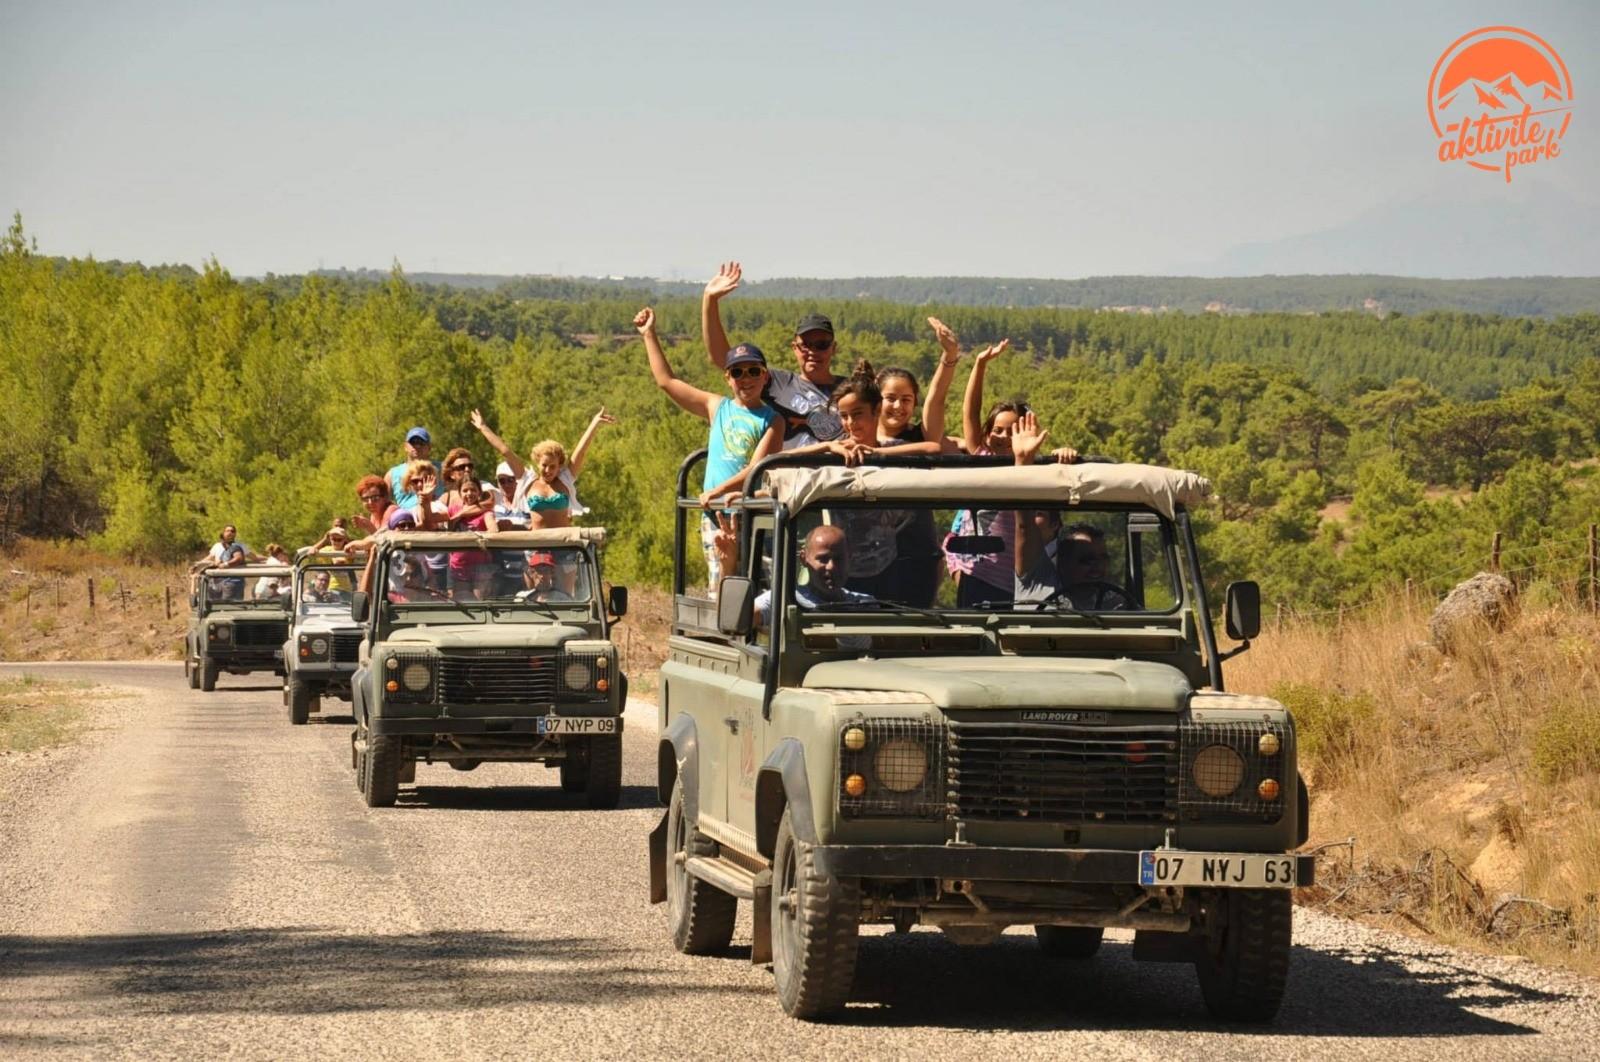 Artvin Jeep Safari